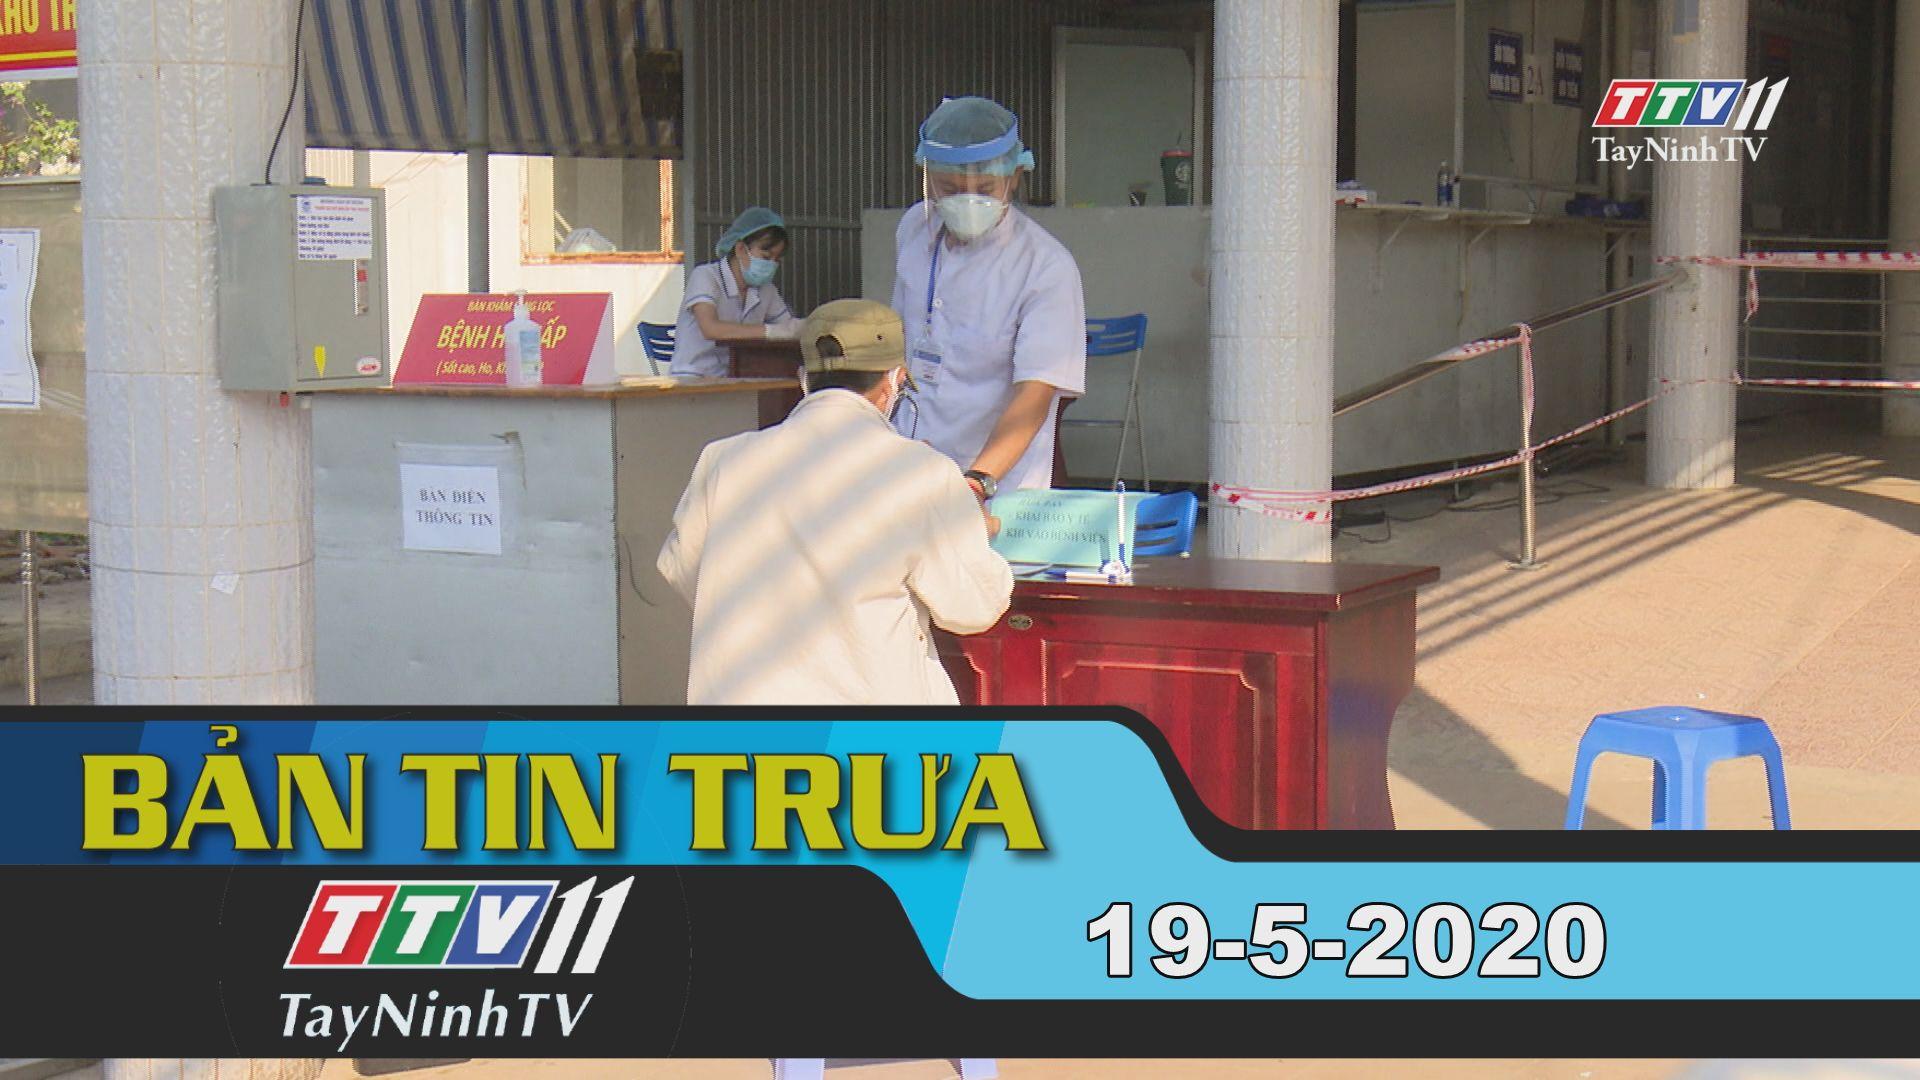 Bản tin trưa 19-5-2020 | Tin tức hôm nay | TayNinhTV